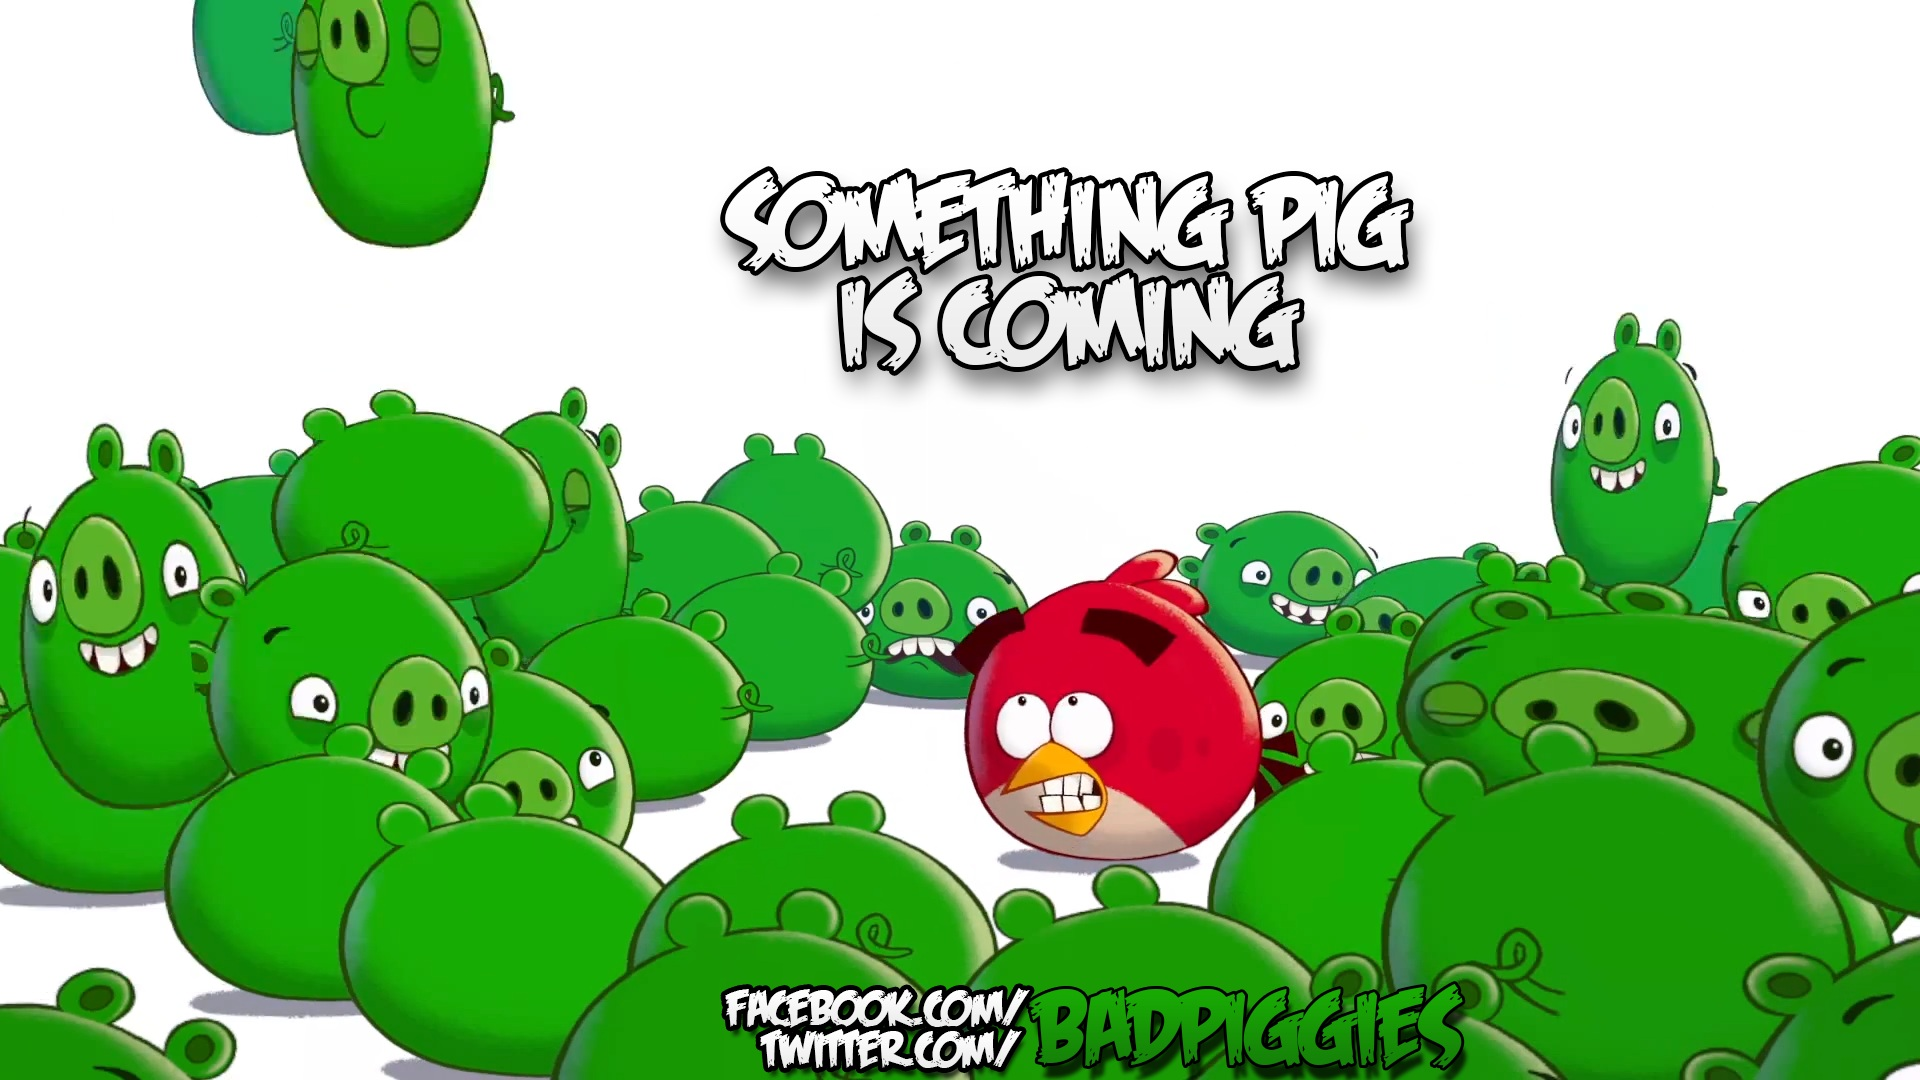 Bad Piggies wallpaper 3